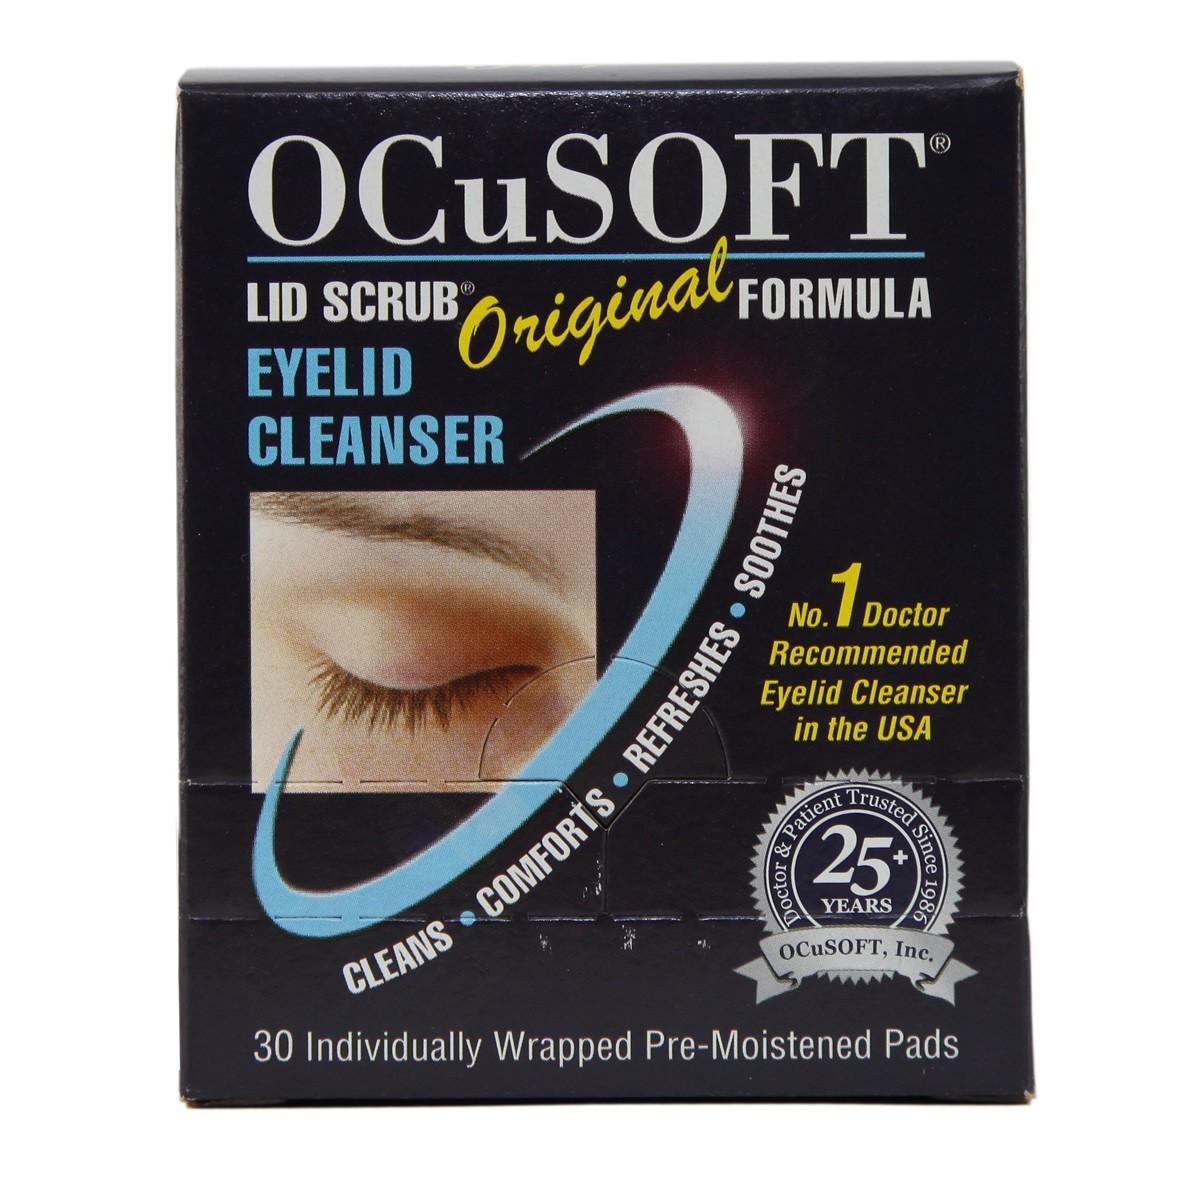 OcuSoft Lid Scrub Original Formula Eyelid Cleanser Pads